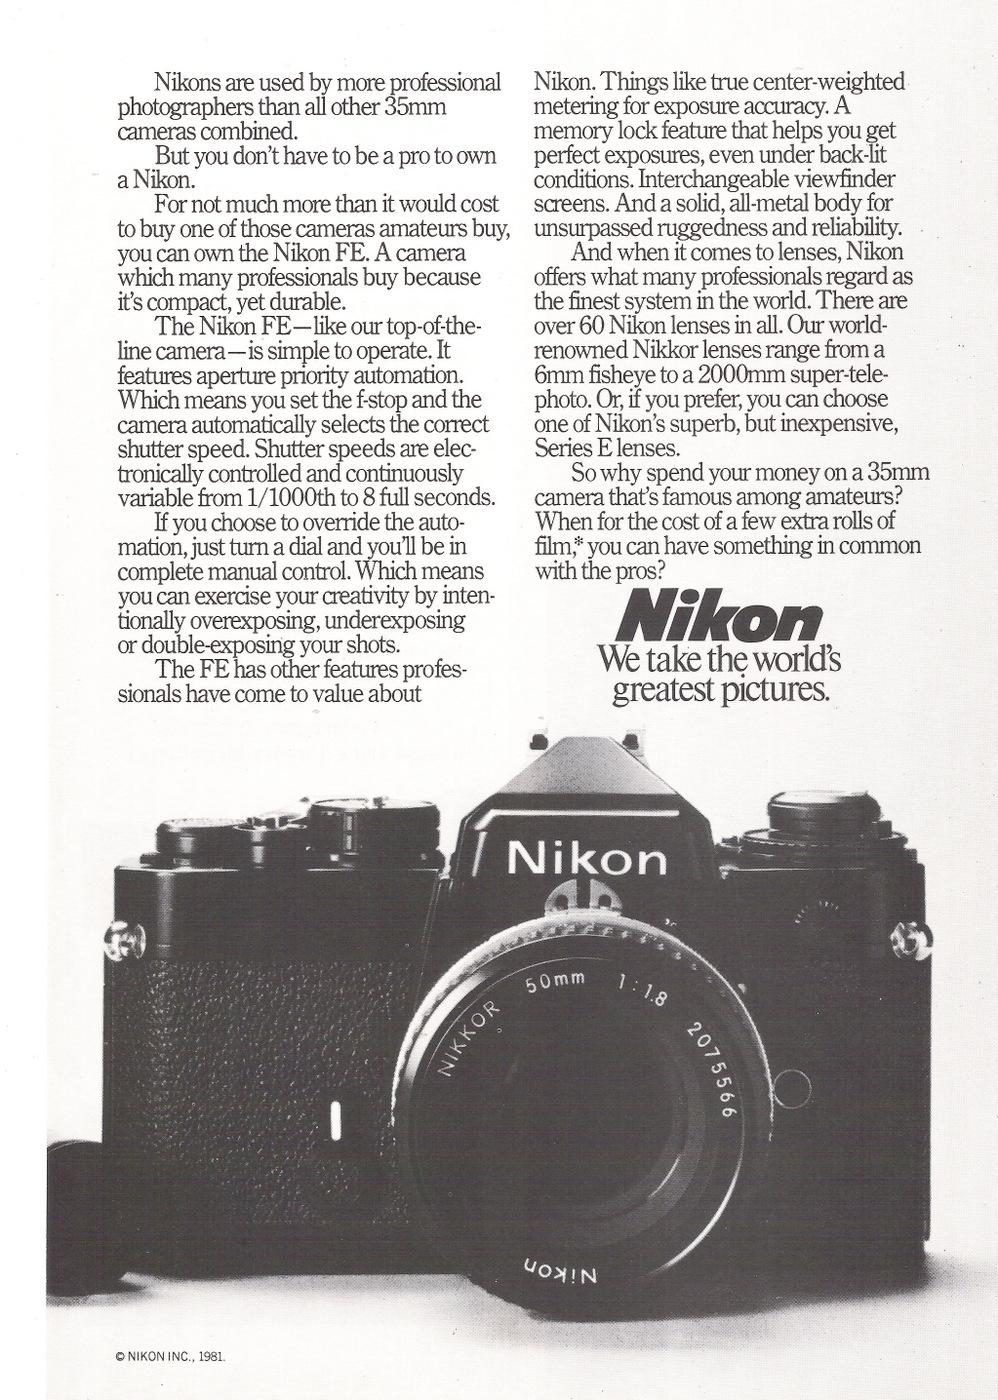 Magazine ad circa 1981